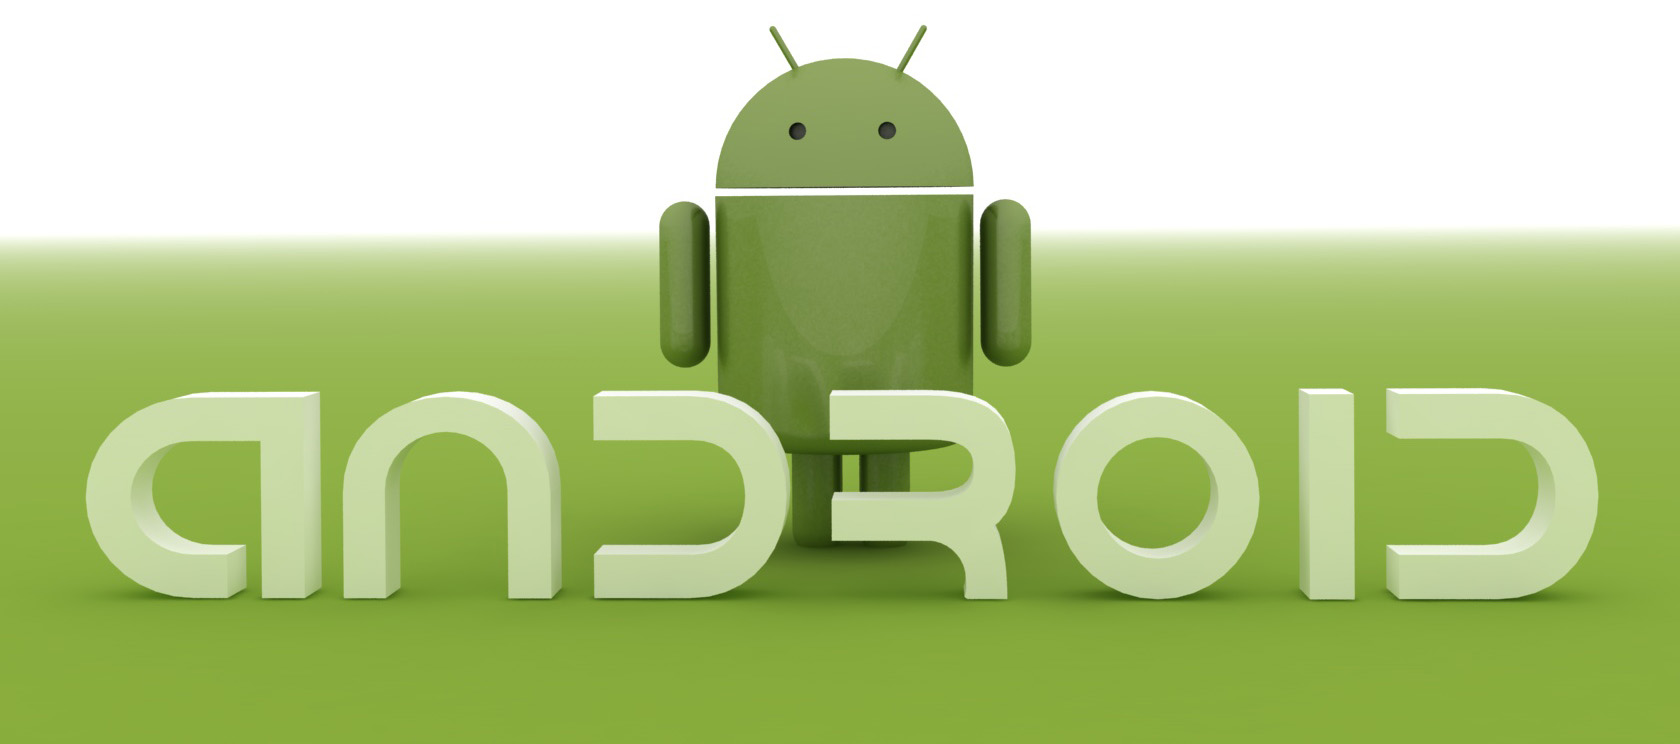 Преимущества смартфонов на чистой ОС Android - логотип андроид